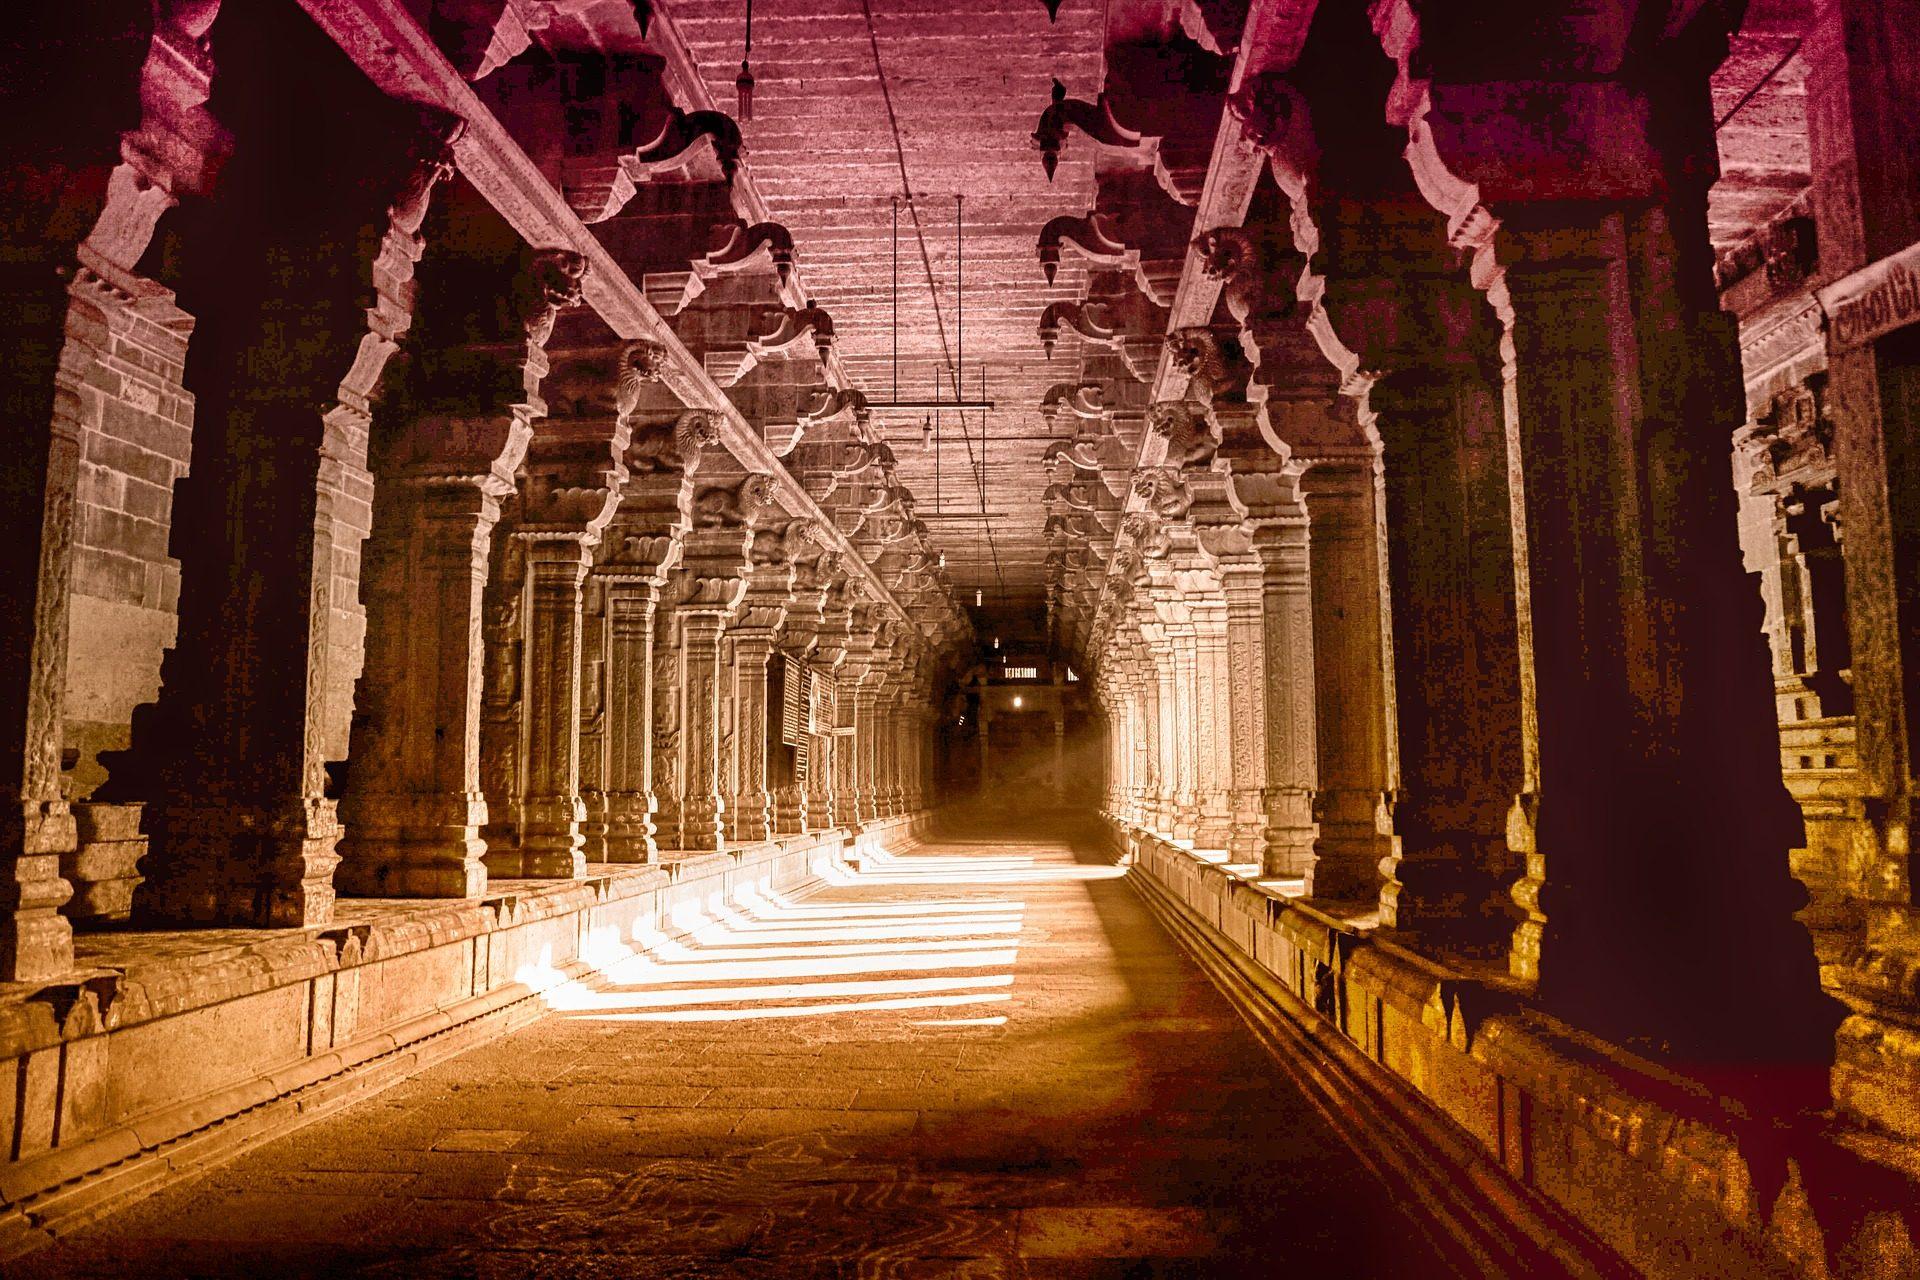 Fondo de pantalla de pasaje tunel corredor columnas for Pilares y columnas